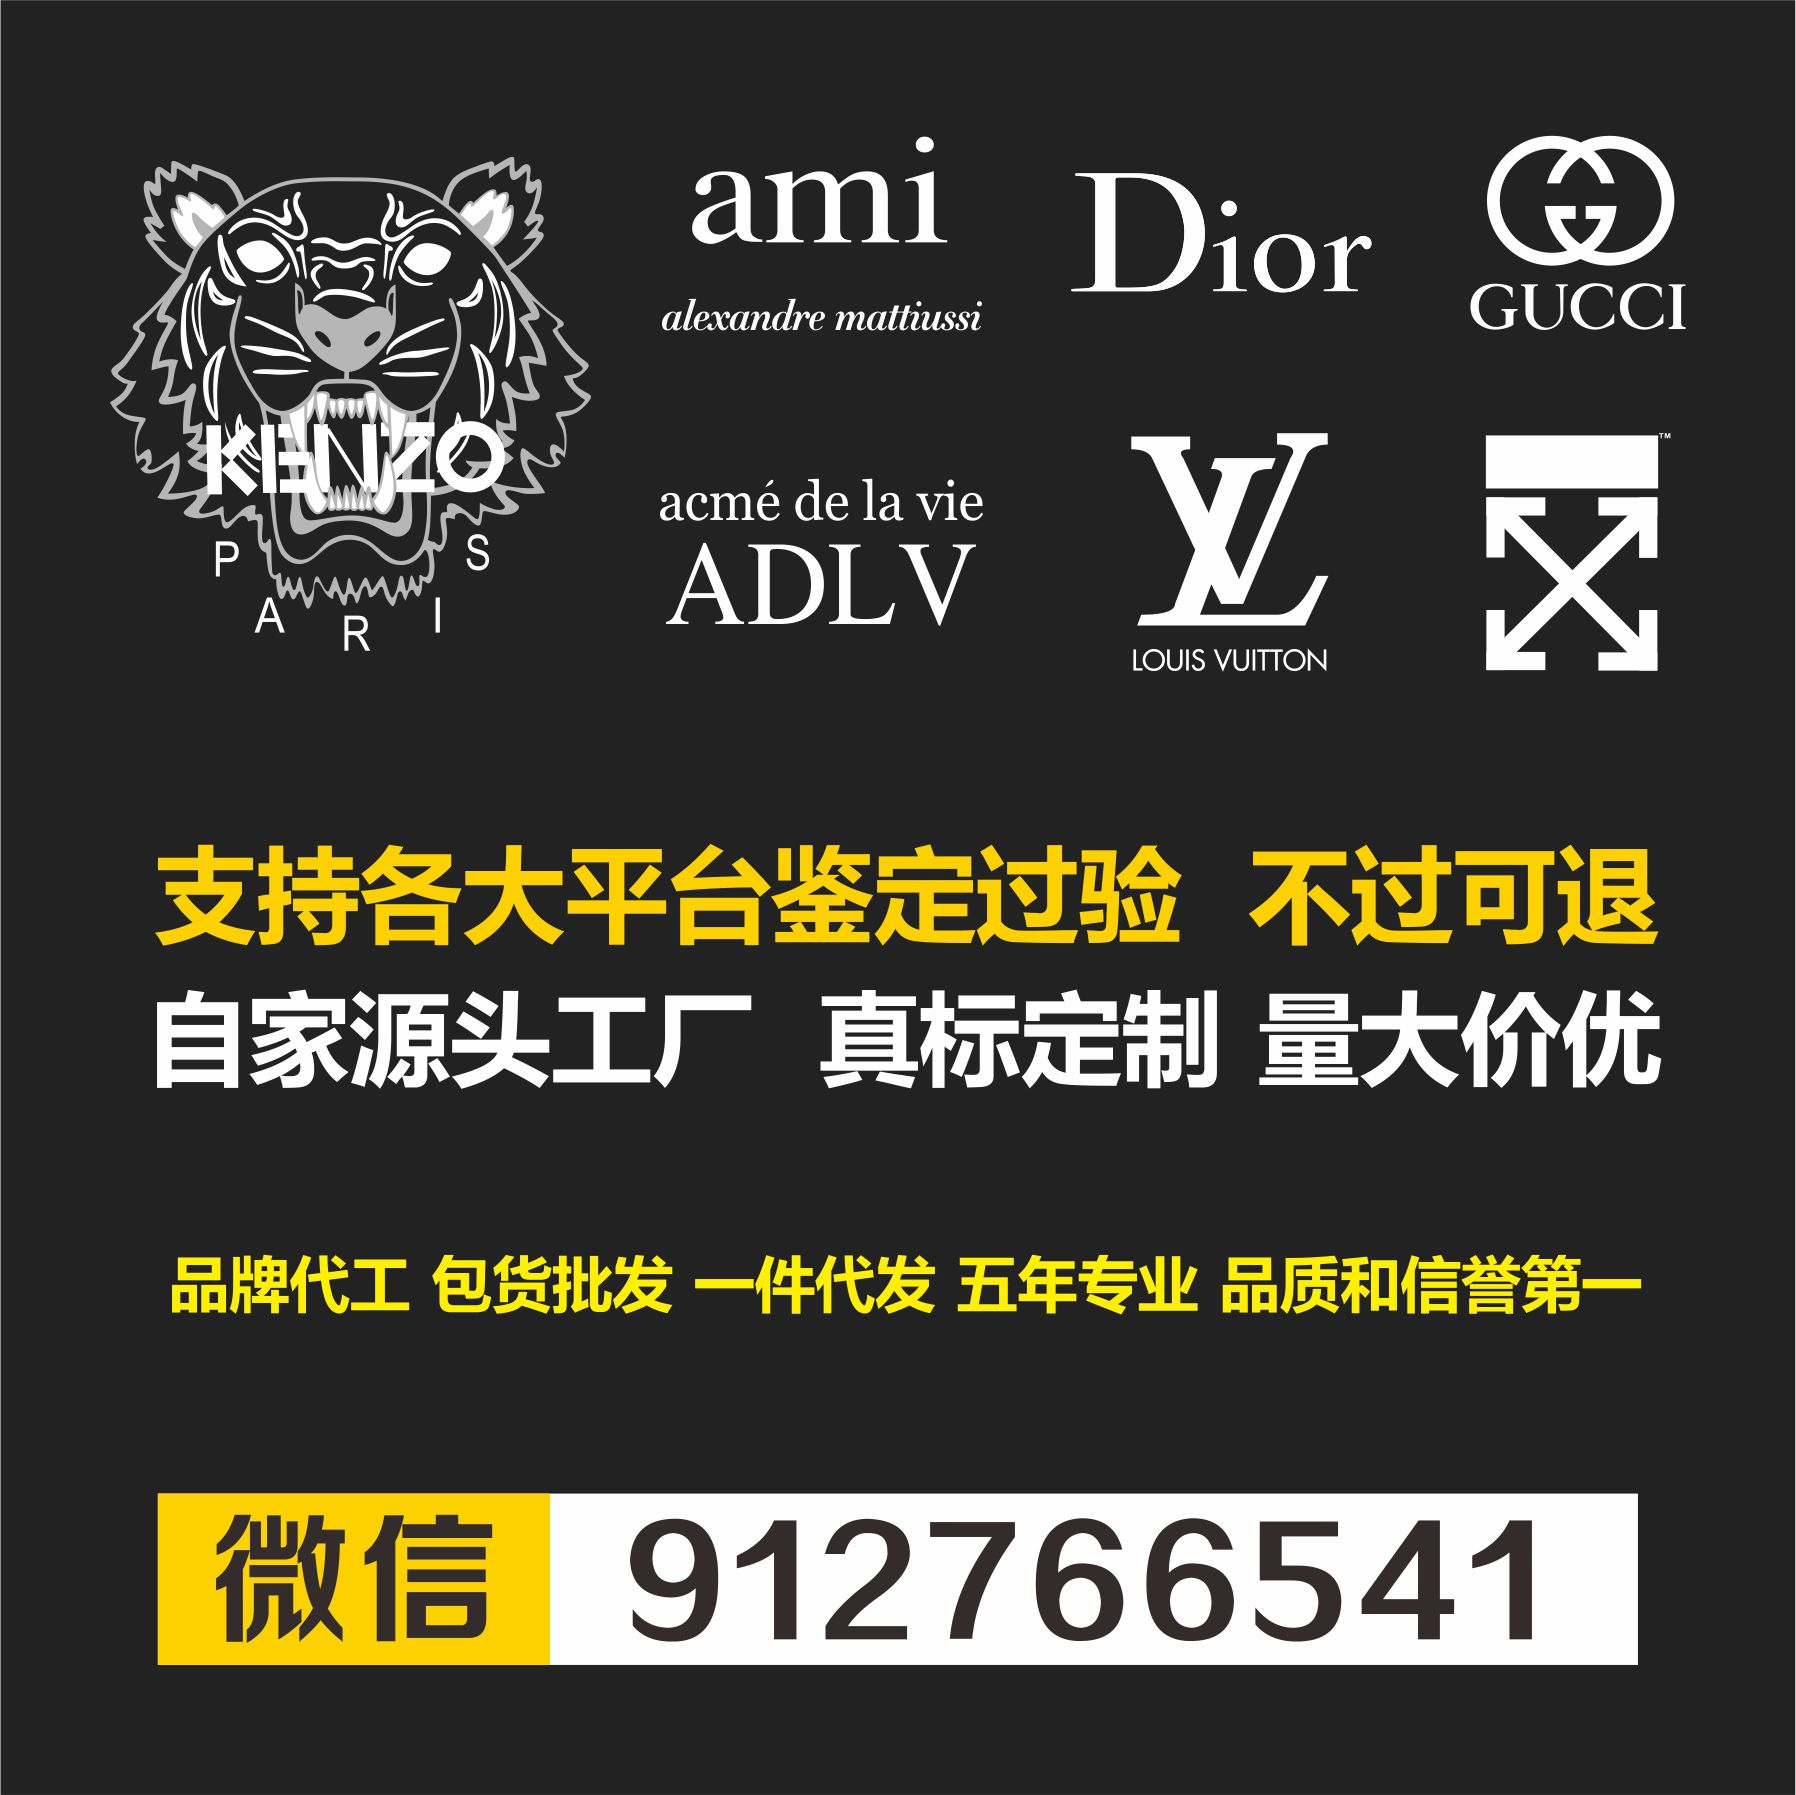 KENZO ami Dior OW ADLV真标过验 自厂货源